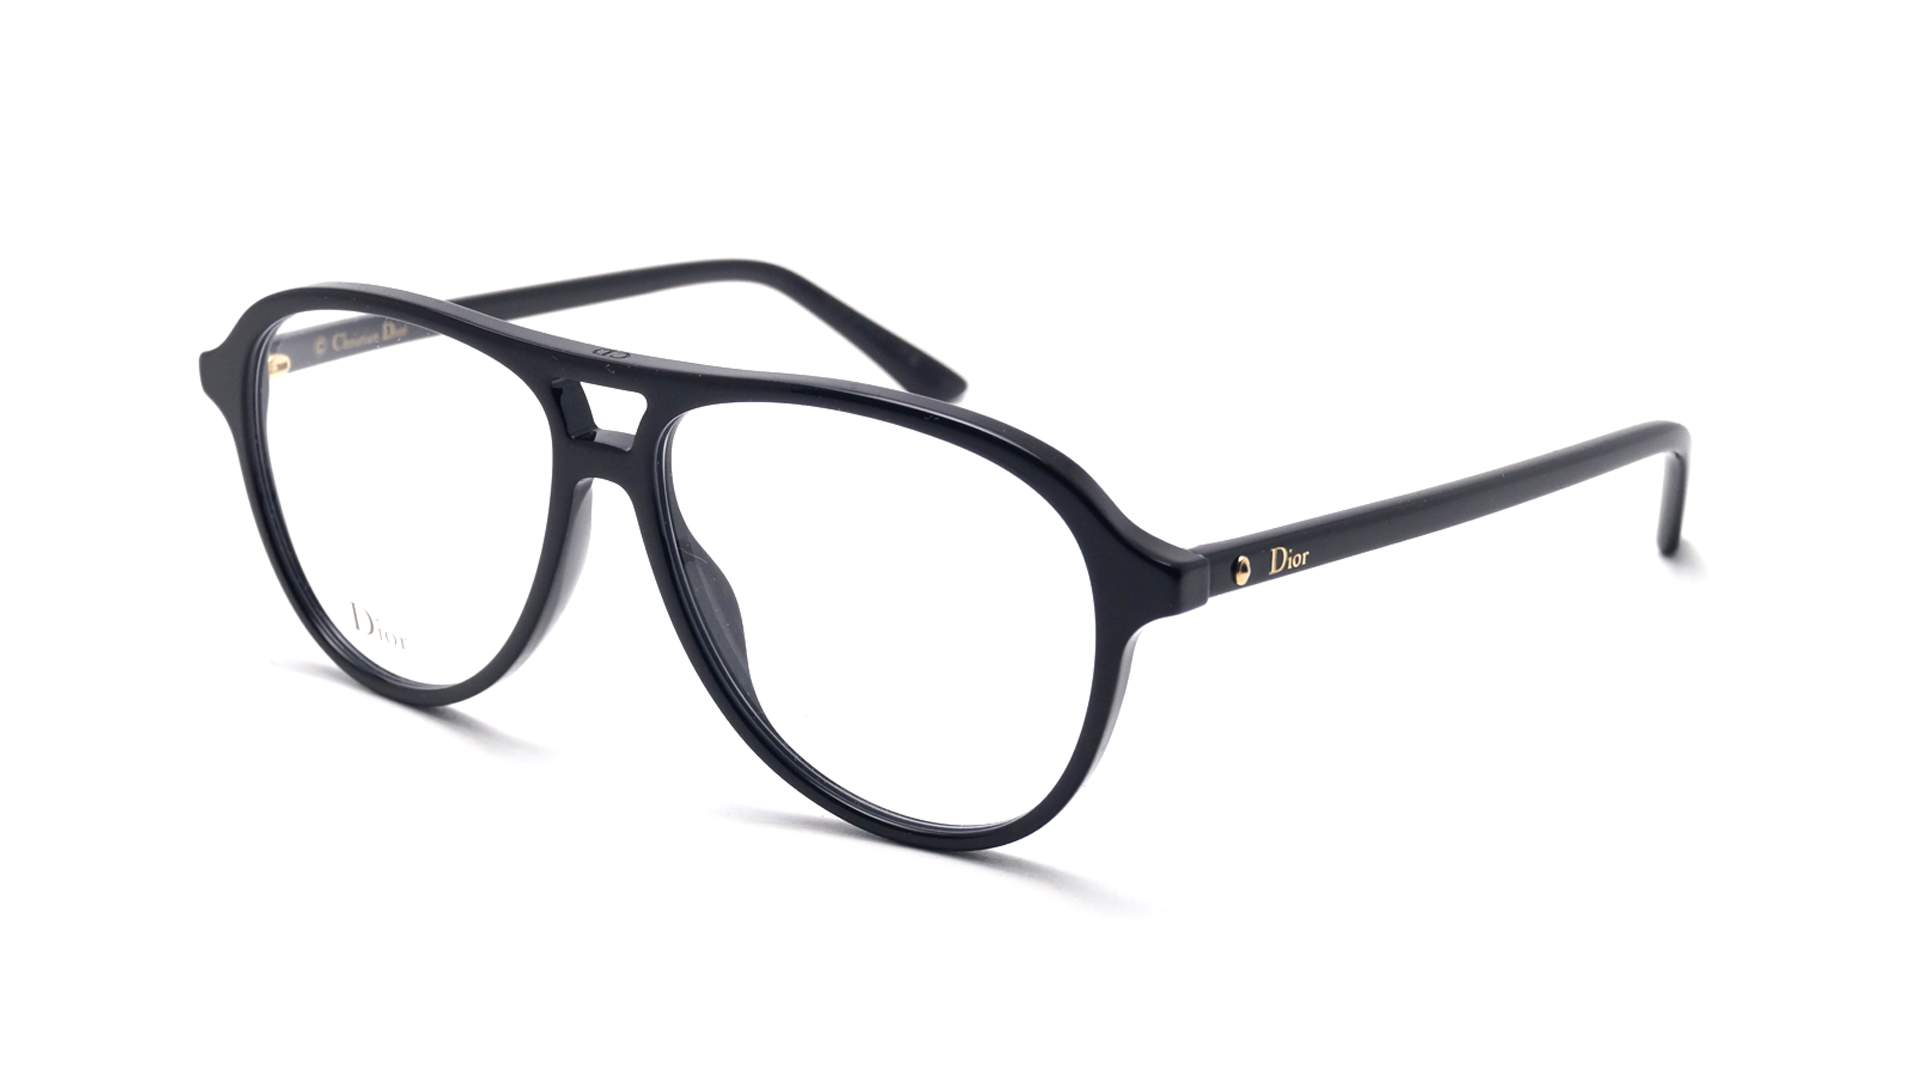 87b7b08abcc8 Eyeglasses Dior Montaigne 52 Black MONTAIGNE52 807 54-13 Large